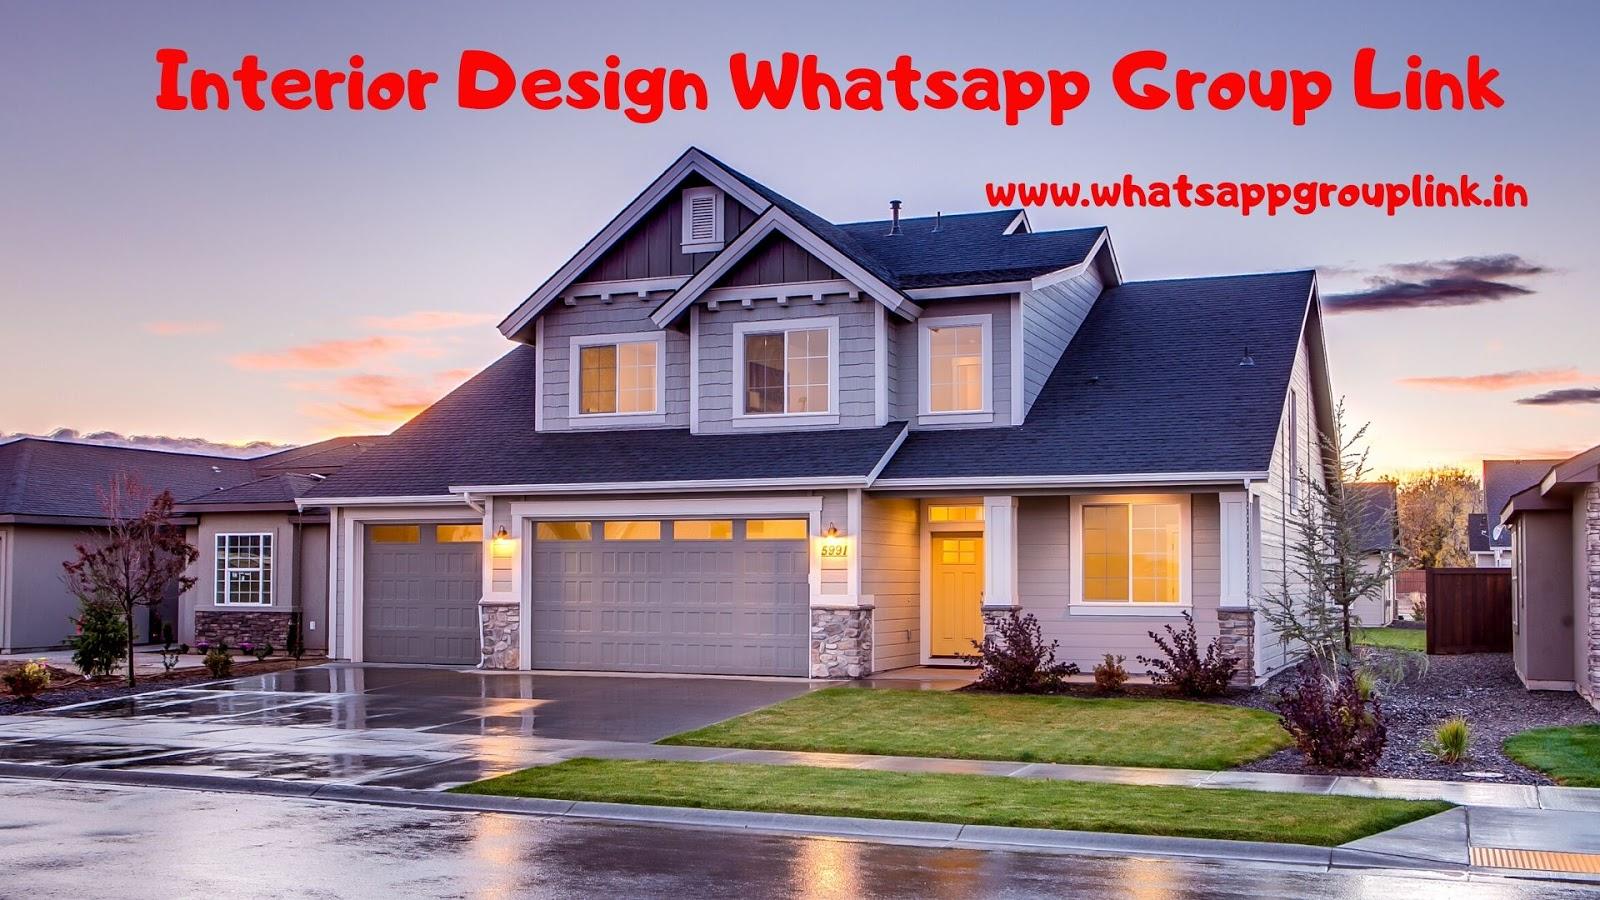 Interior Design Whatsapp Group Link Whatsappgrouplink